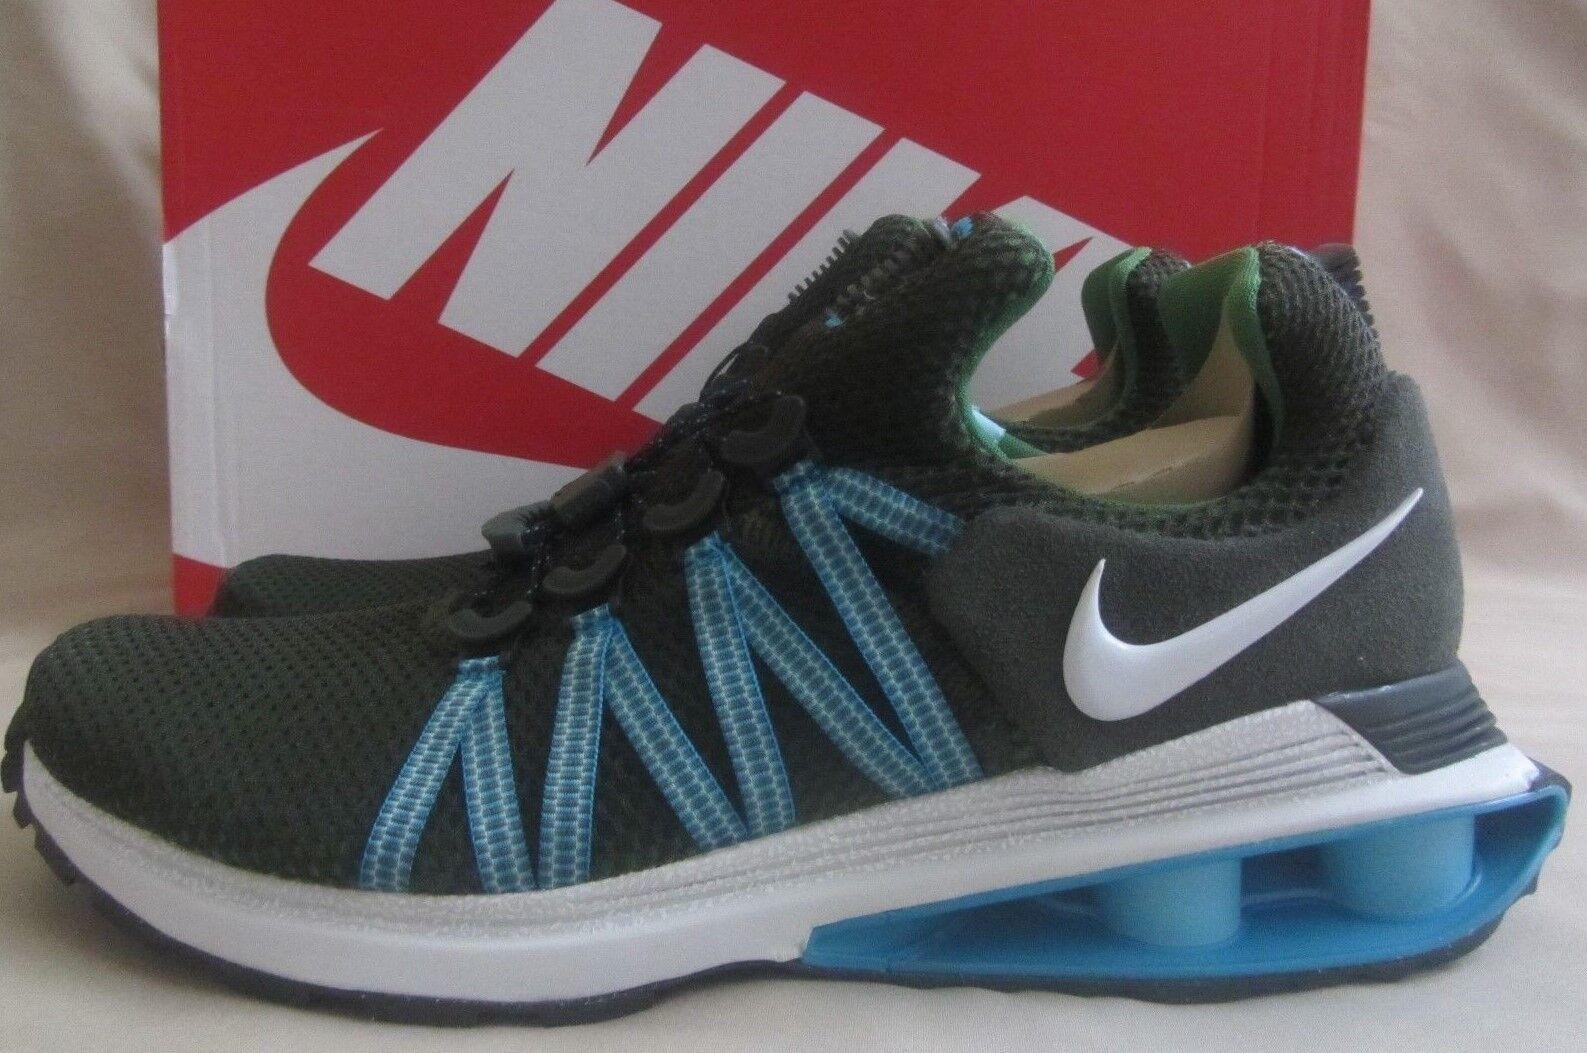 Nike Shox Gravity Sneakers Mens 10 Sequoia Green Aqua bluee New With Box